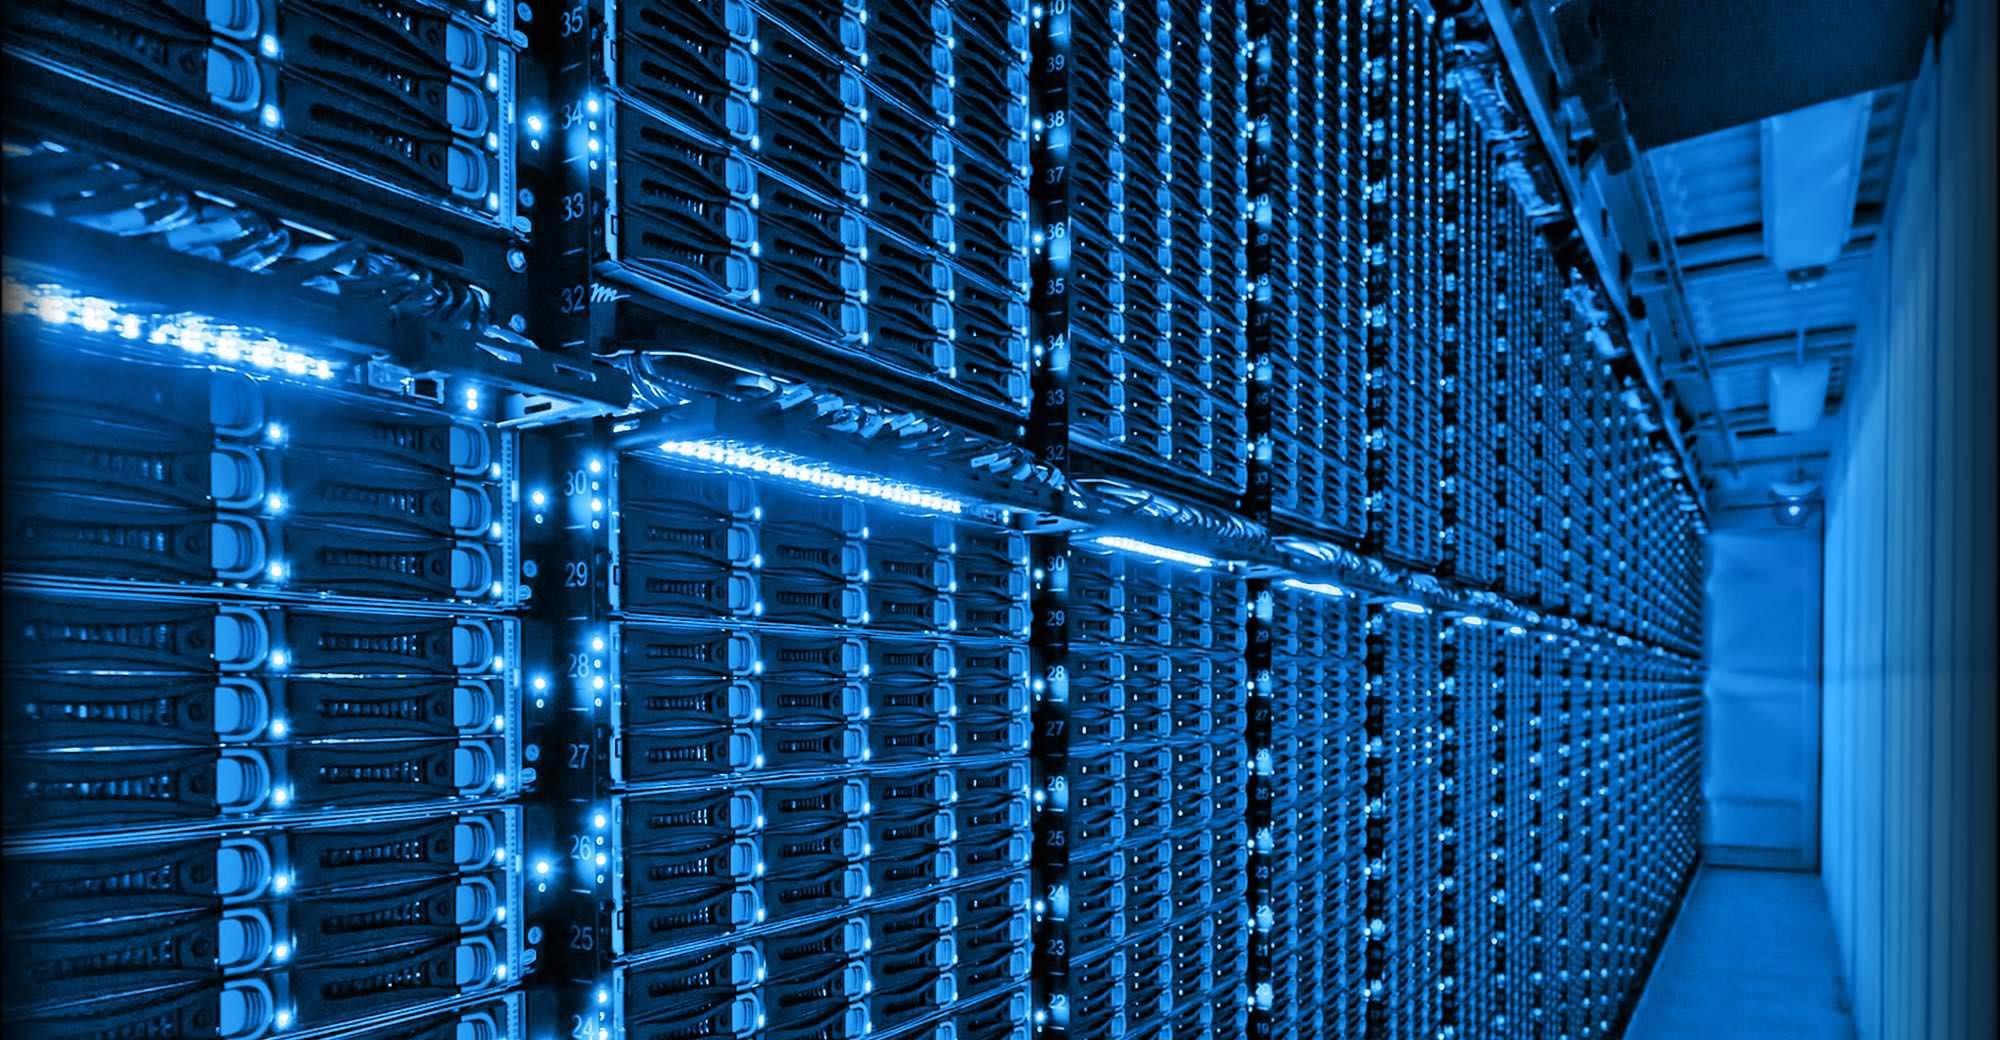 Can racks of cloud servers help save the world? Source: Microsoft